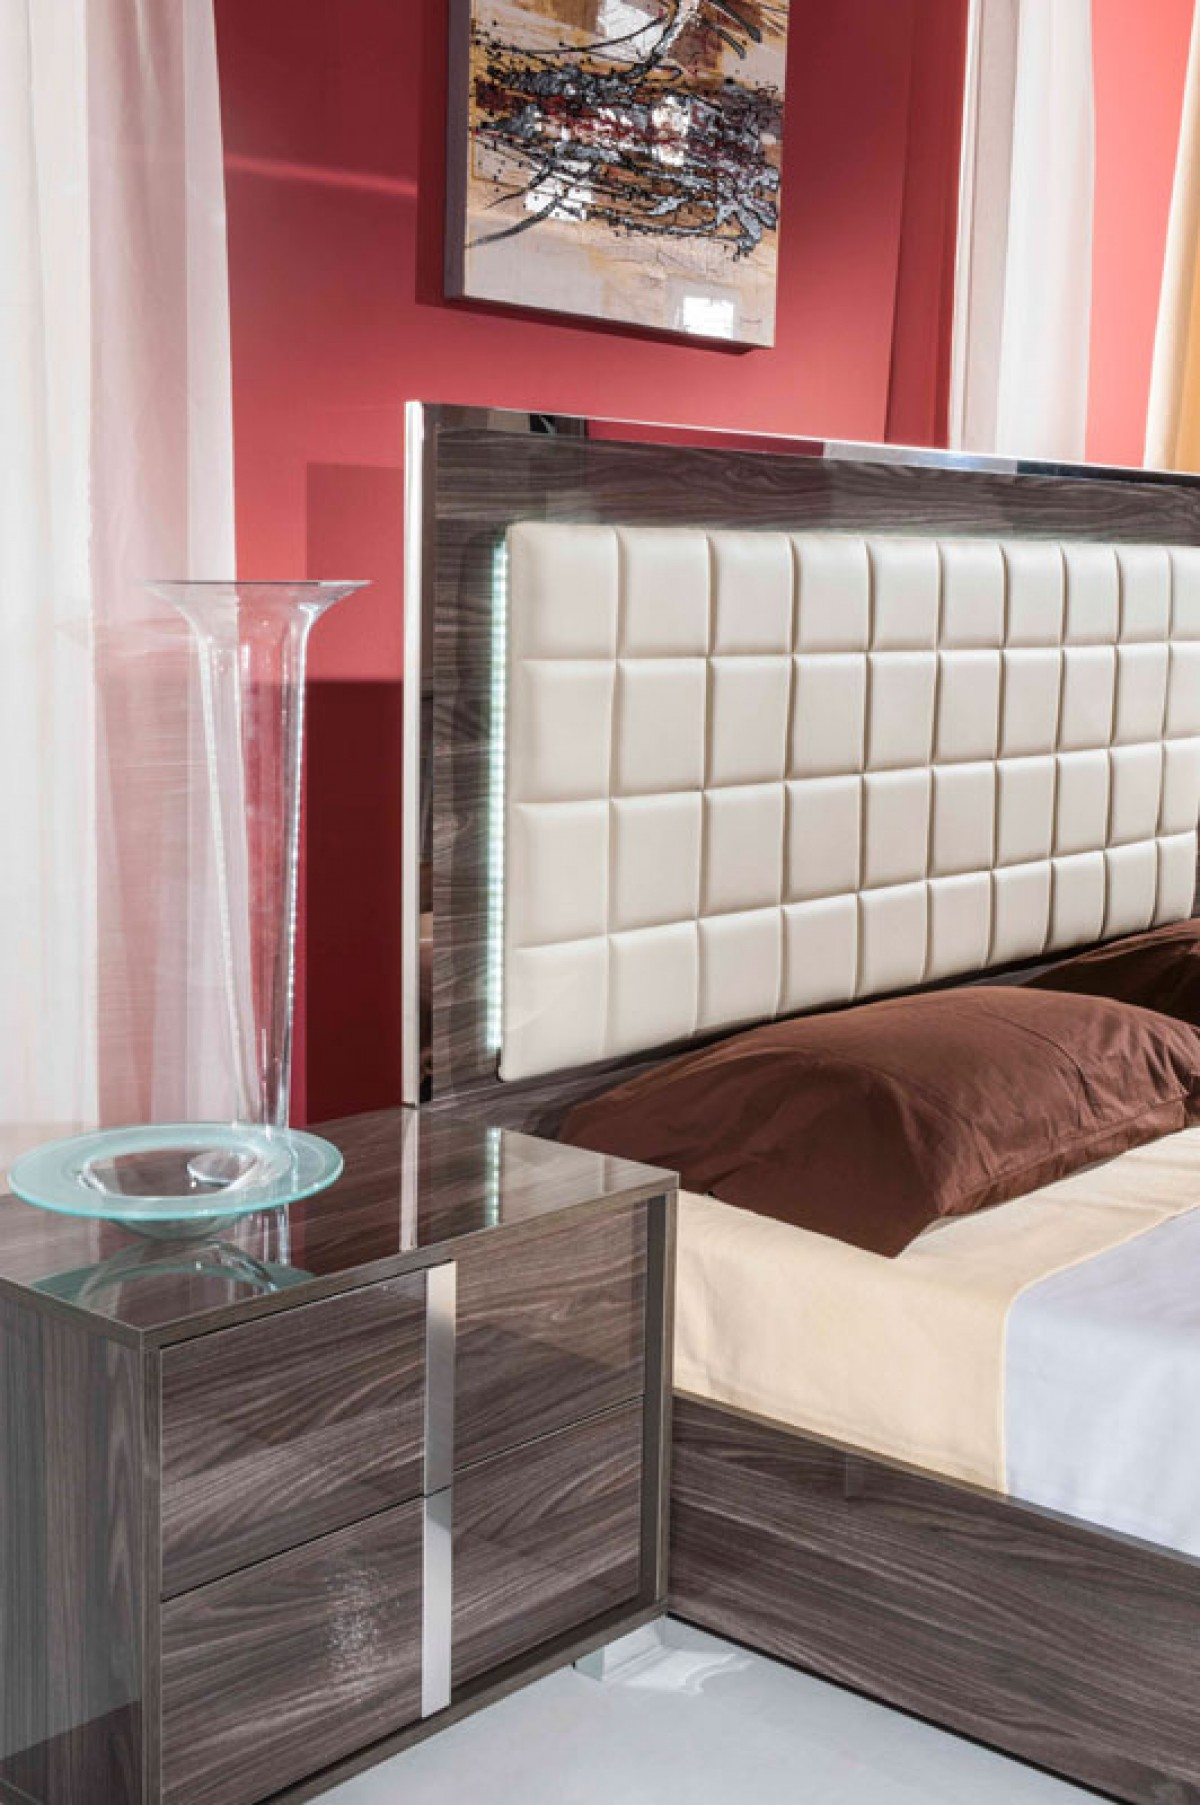 san-francisco-bedroom-set-life-image.jpg